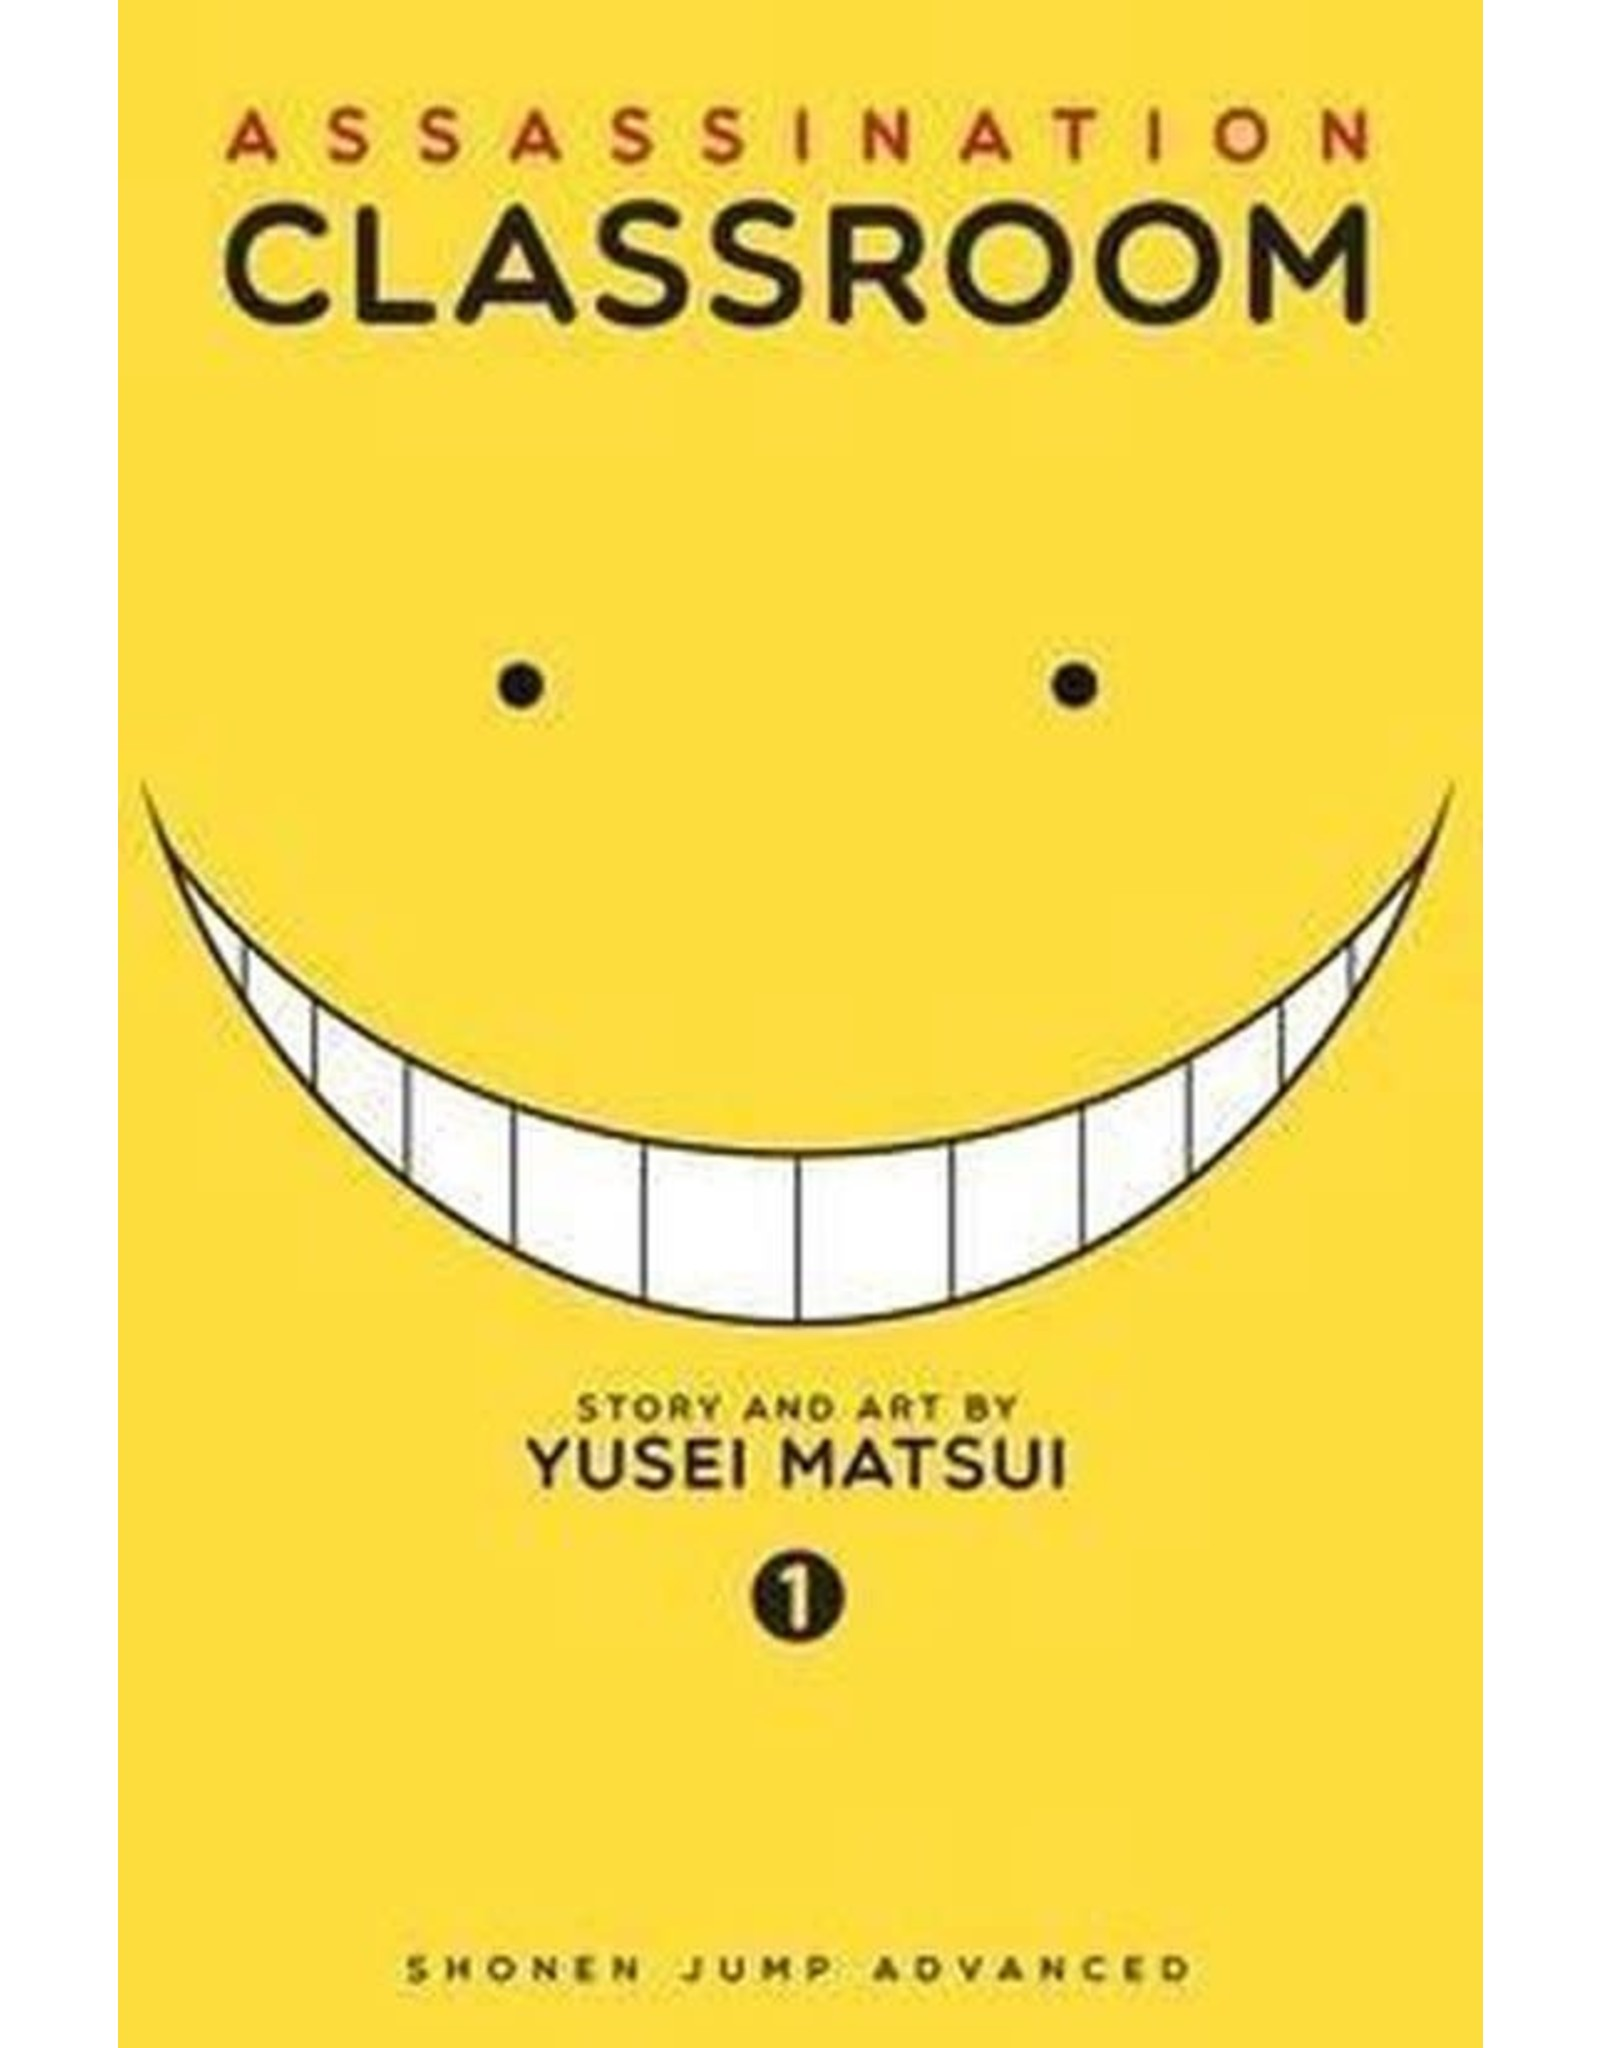 Assassination Classroom 1 (English)